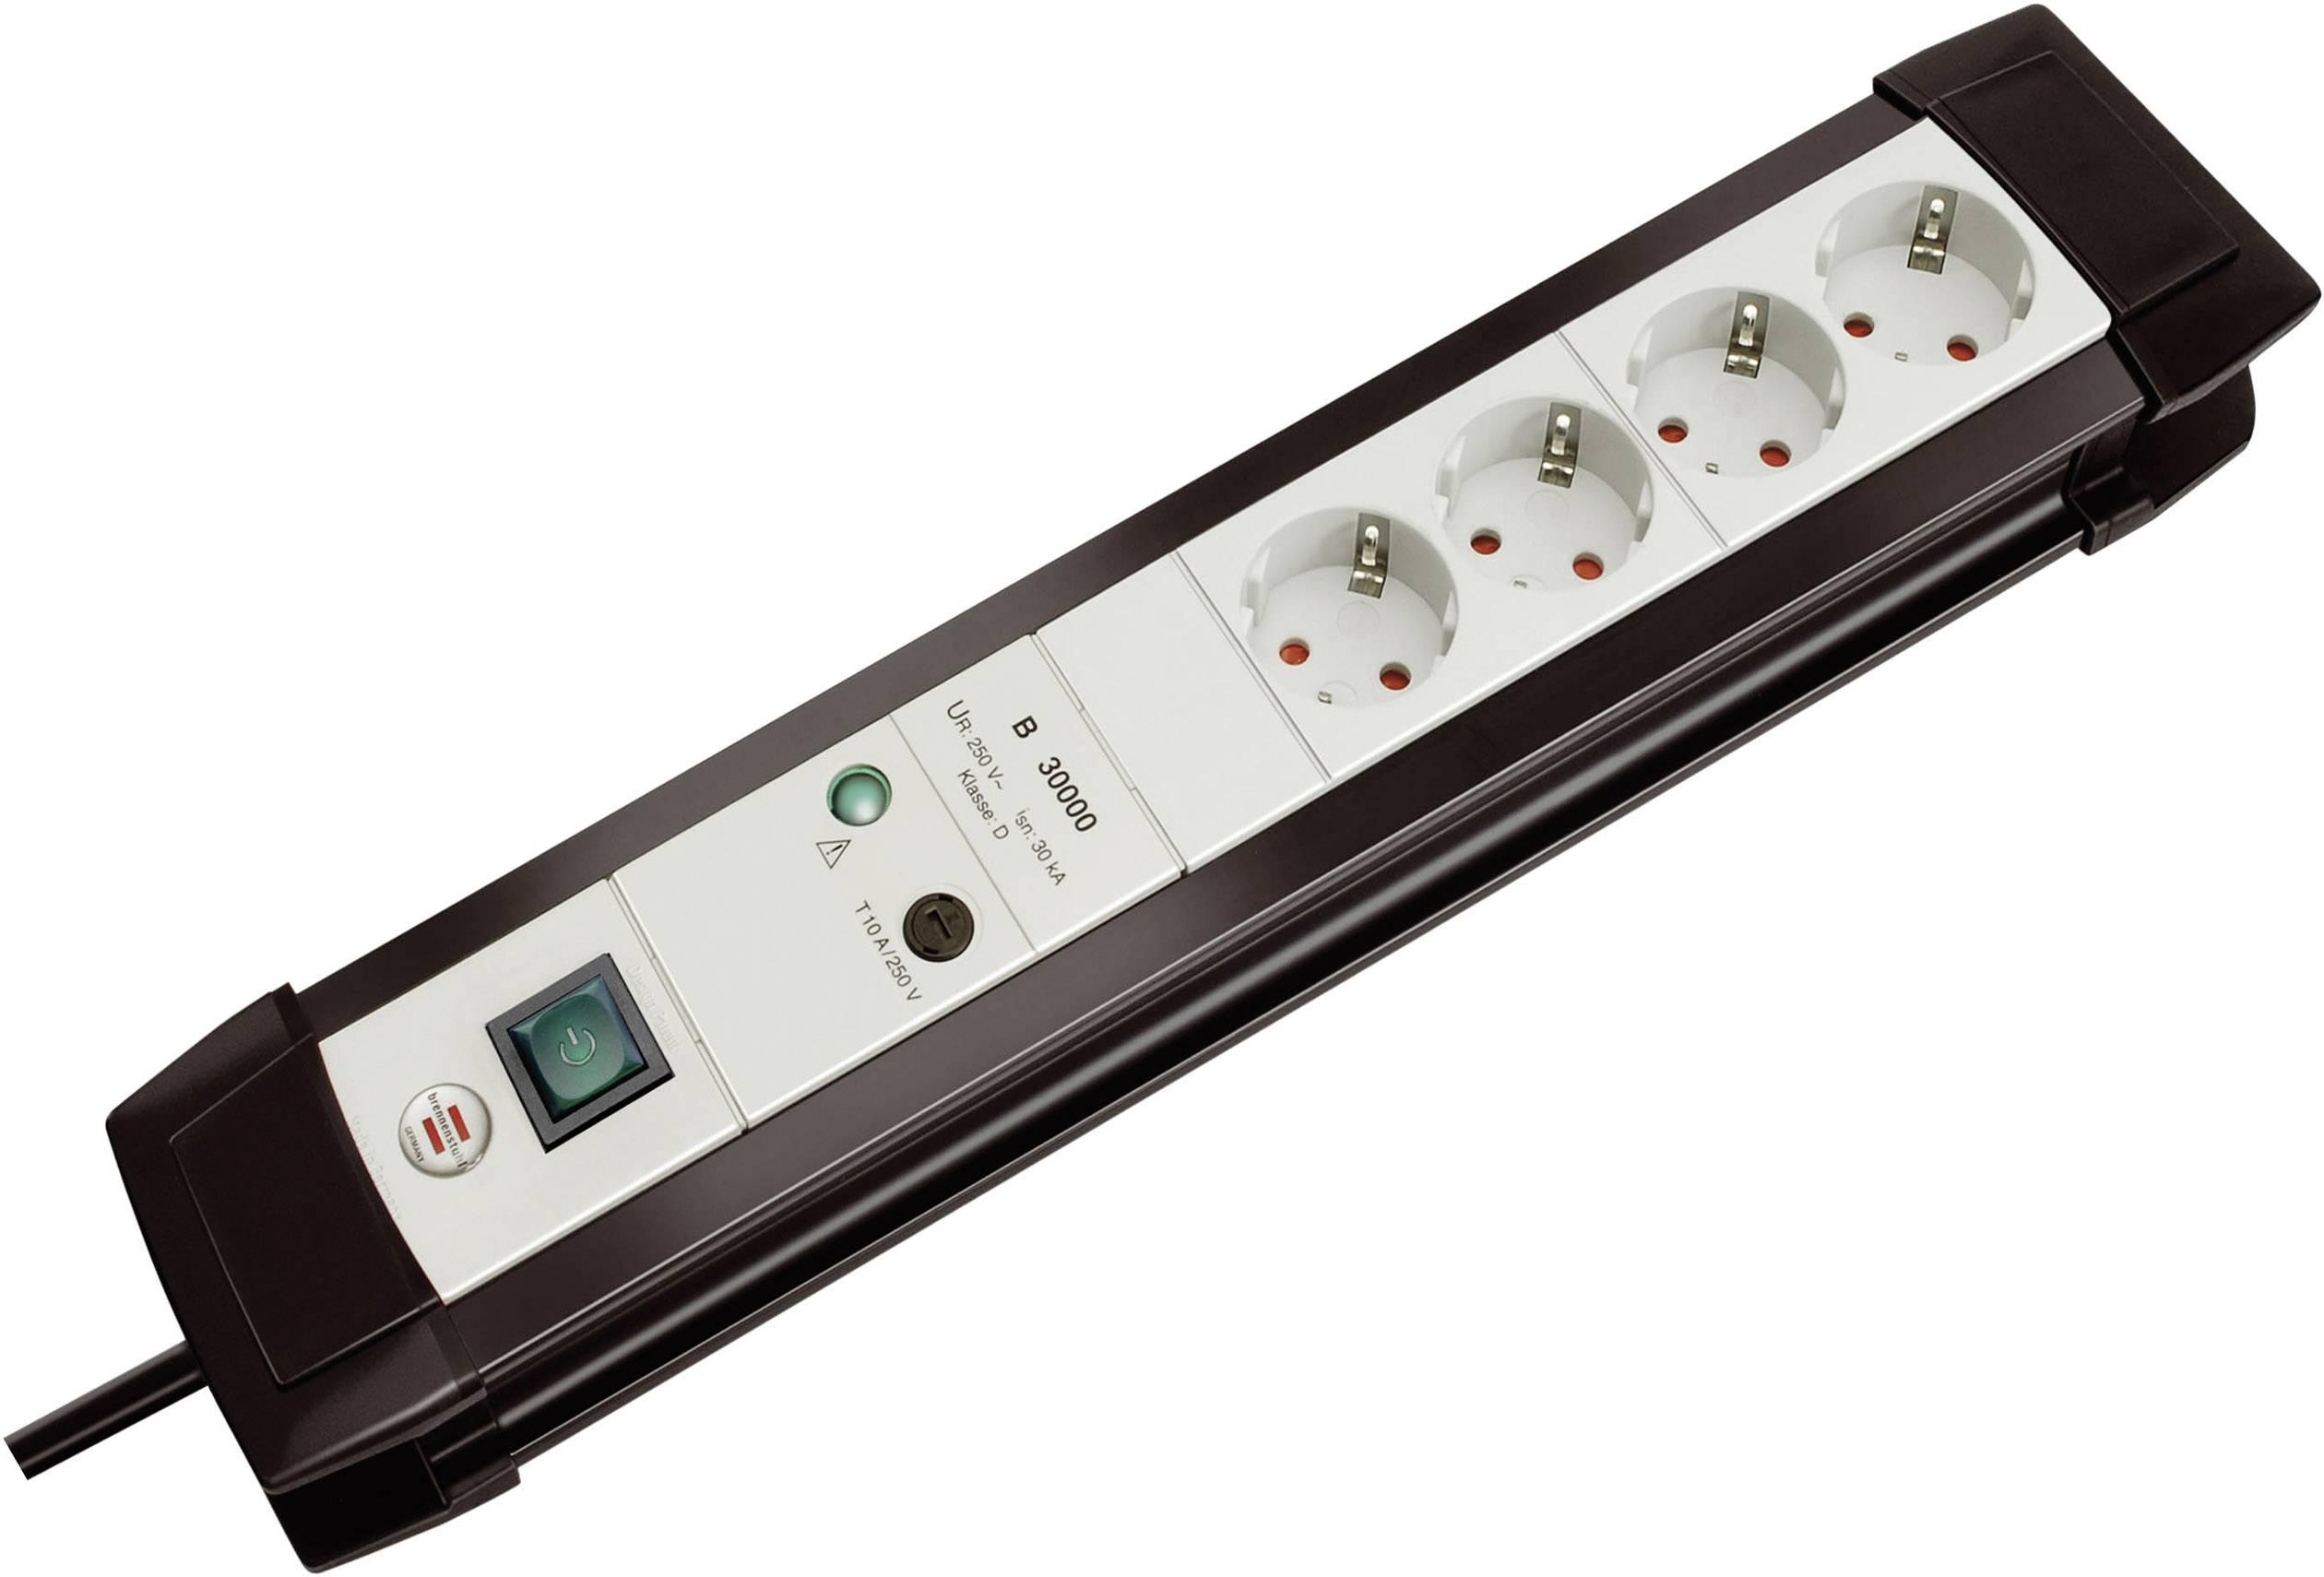 Zásuvková lišta s přepěťovou ochranou Brennenstuhl Premium-Line 30.000A 1157050374, 1.80 m, černá, šedá